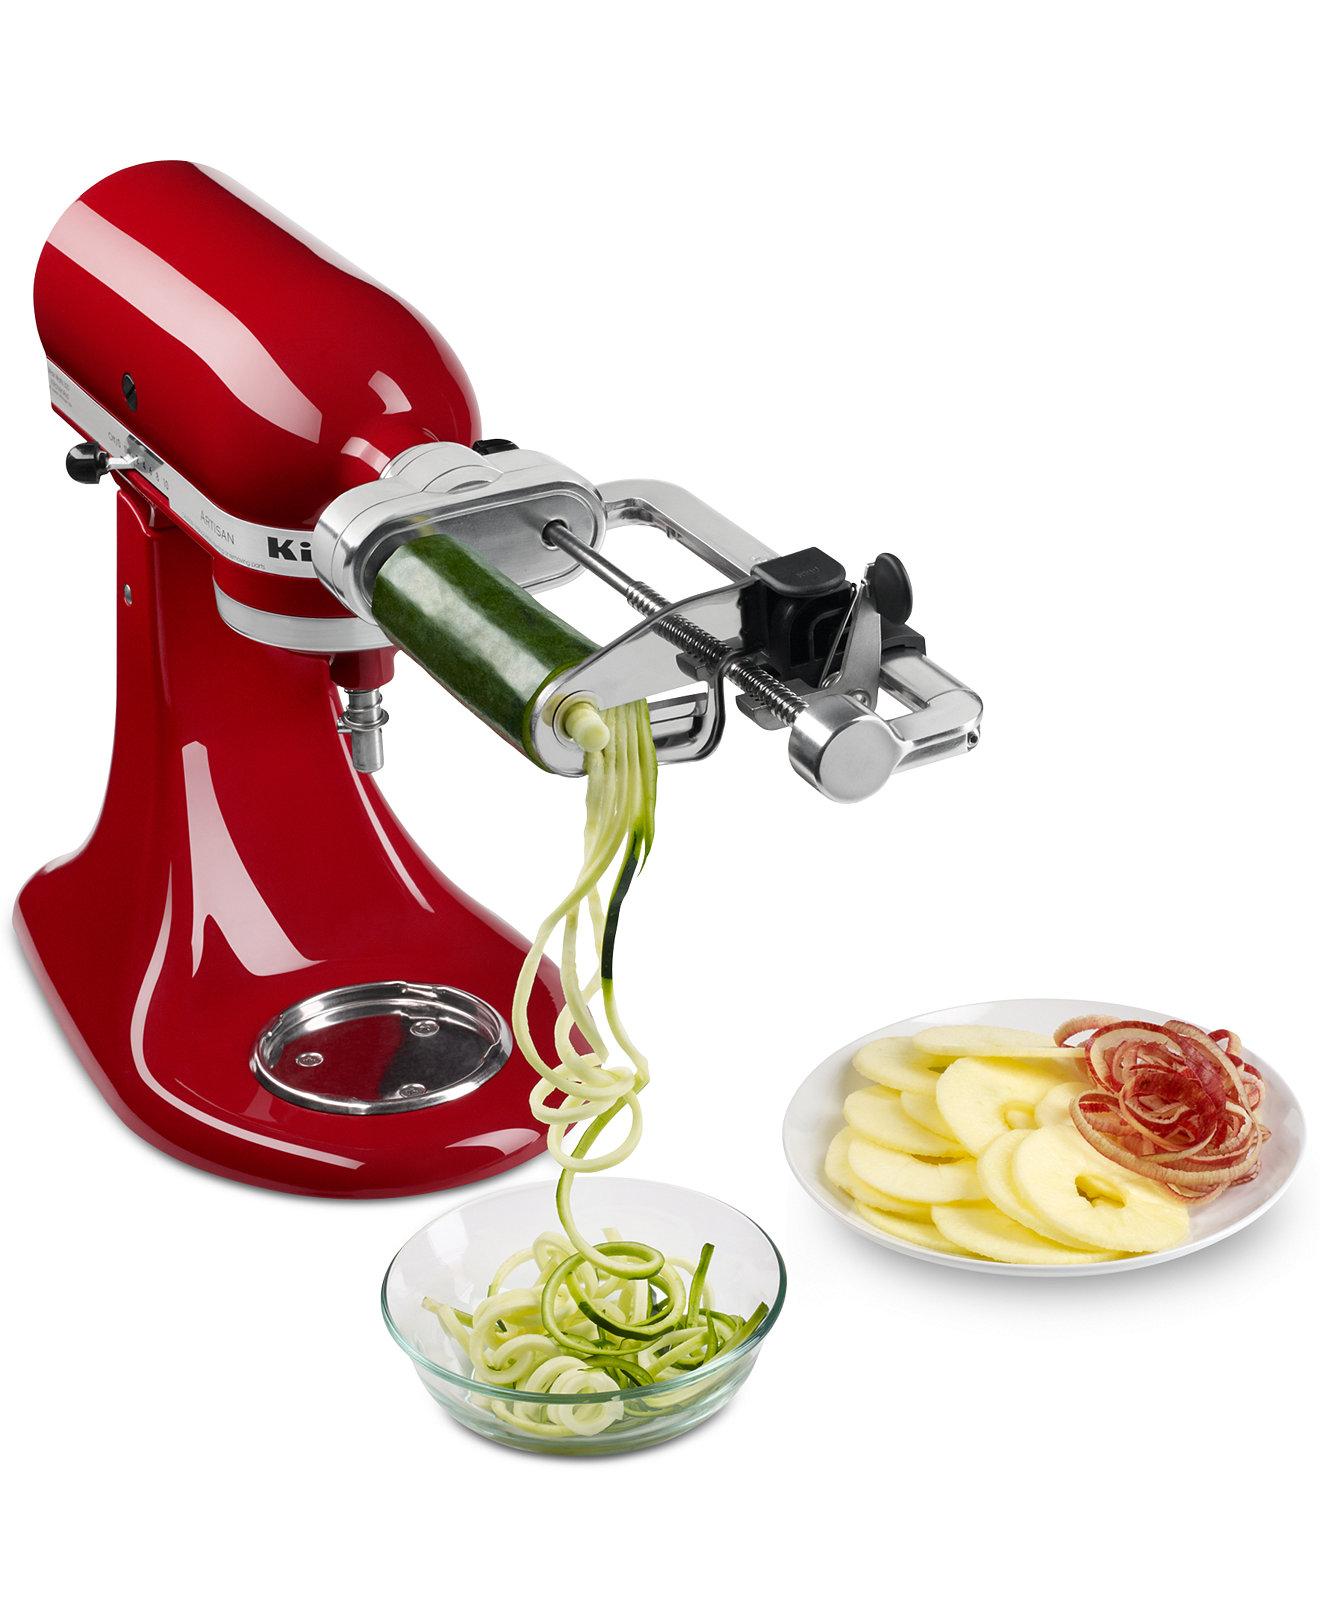 Macys Kitchen Appliances Kitchenaid Ksm1apc Spiralizer Stand Mixer Attachment Electrics